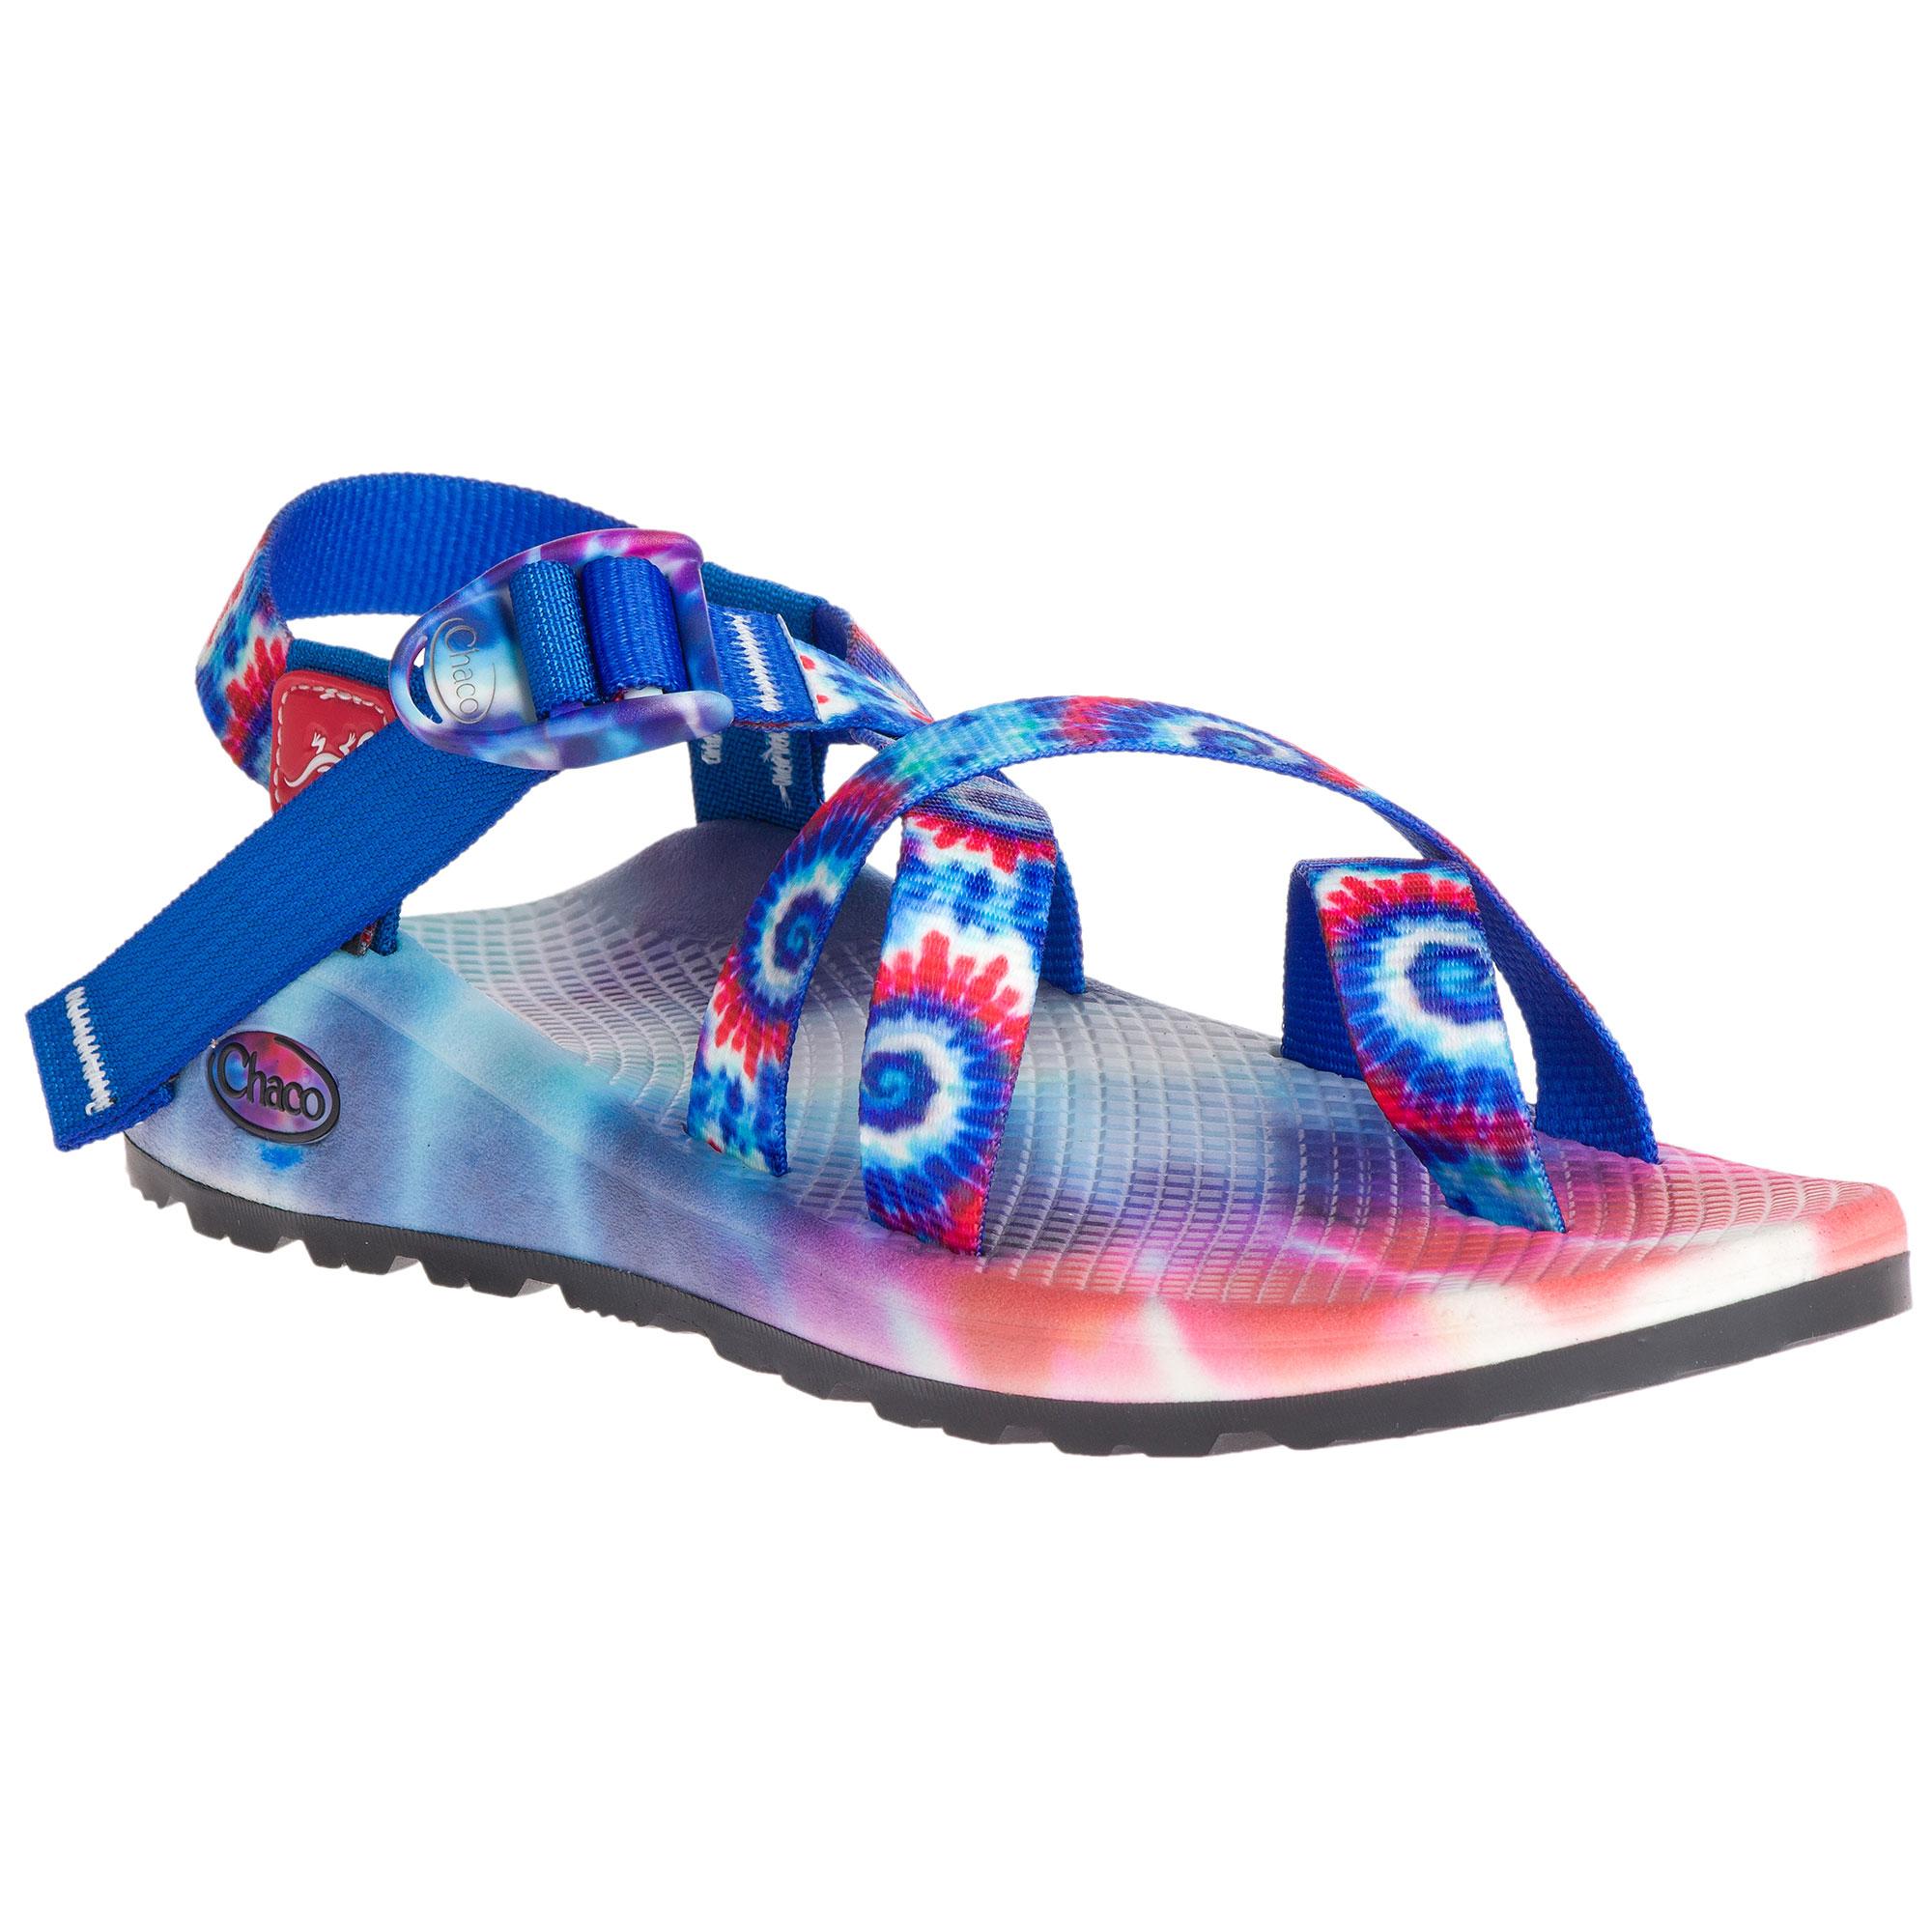 b78f91843b01 Chaco women classic tie dye sandals sun ski sports jpg 2000x2000 Tie dye  sandals